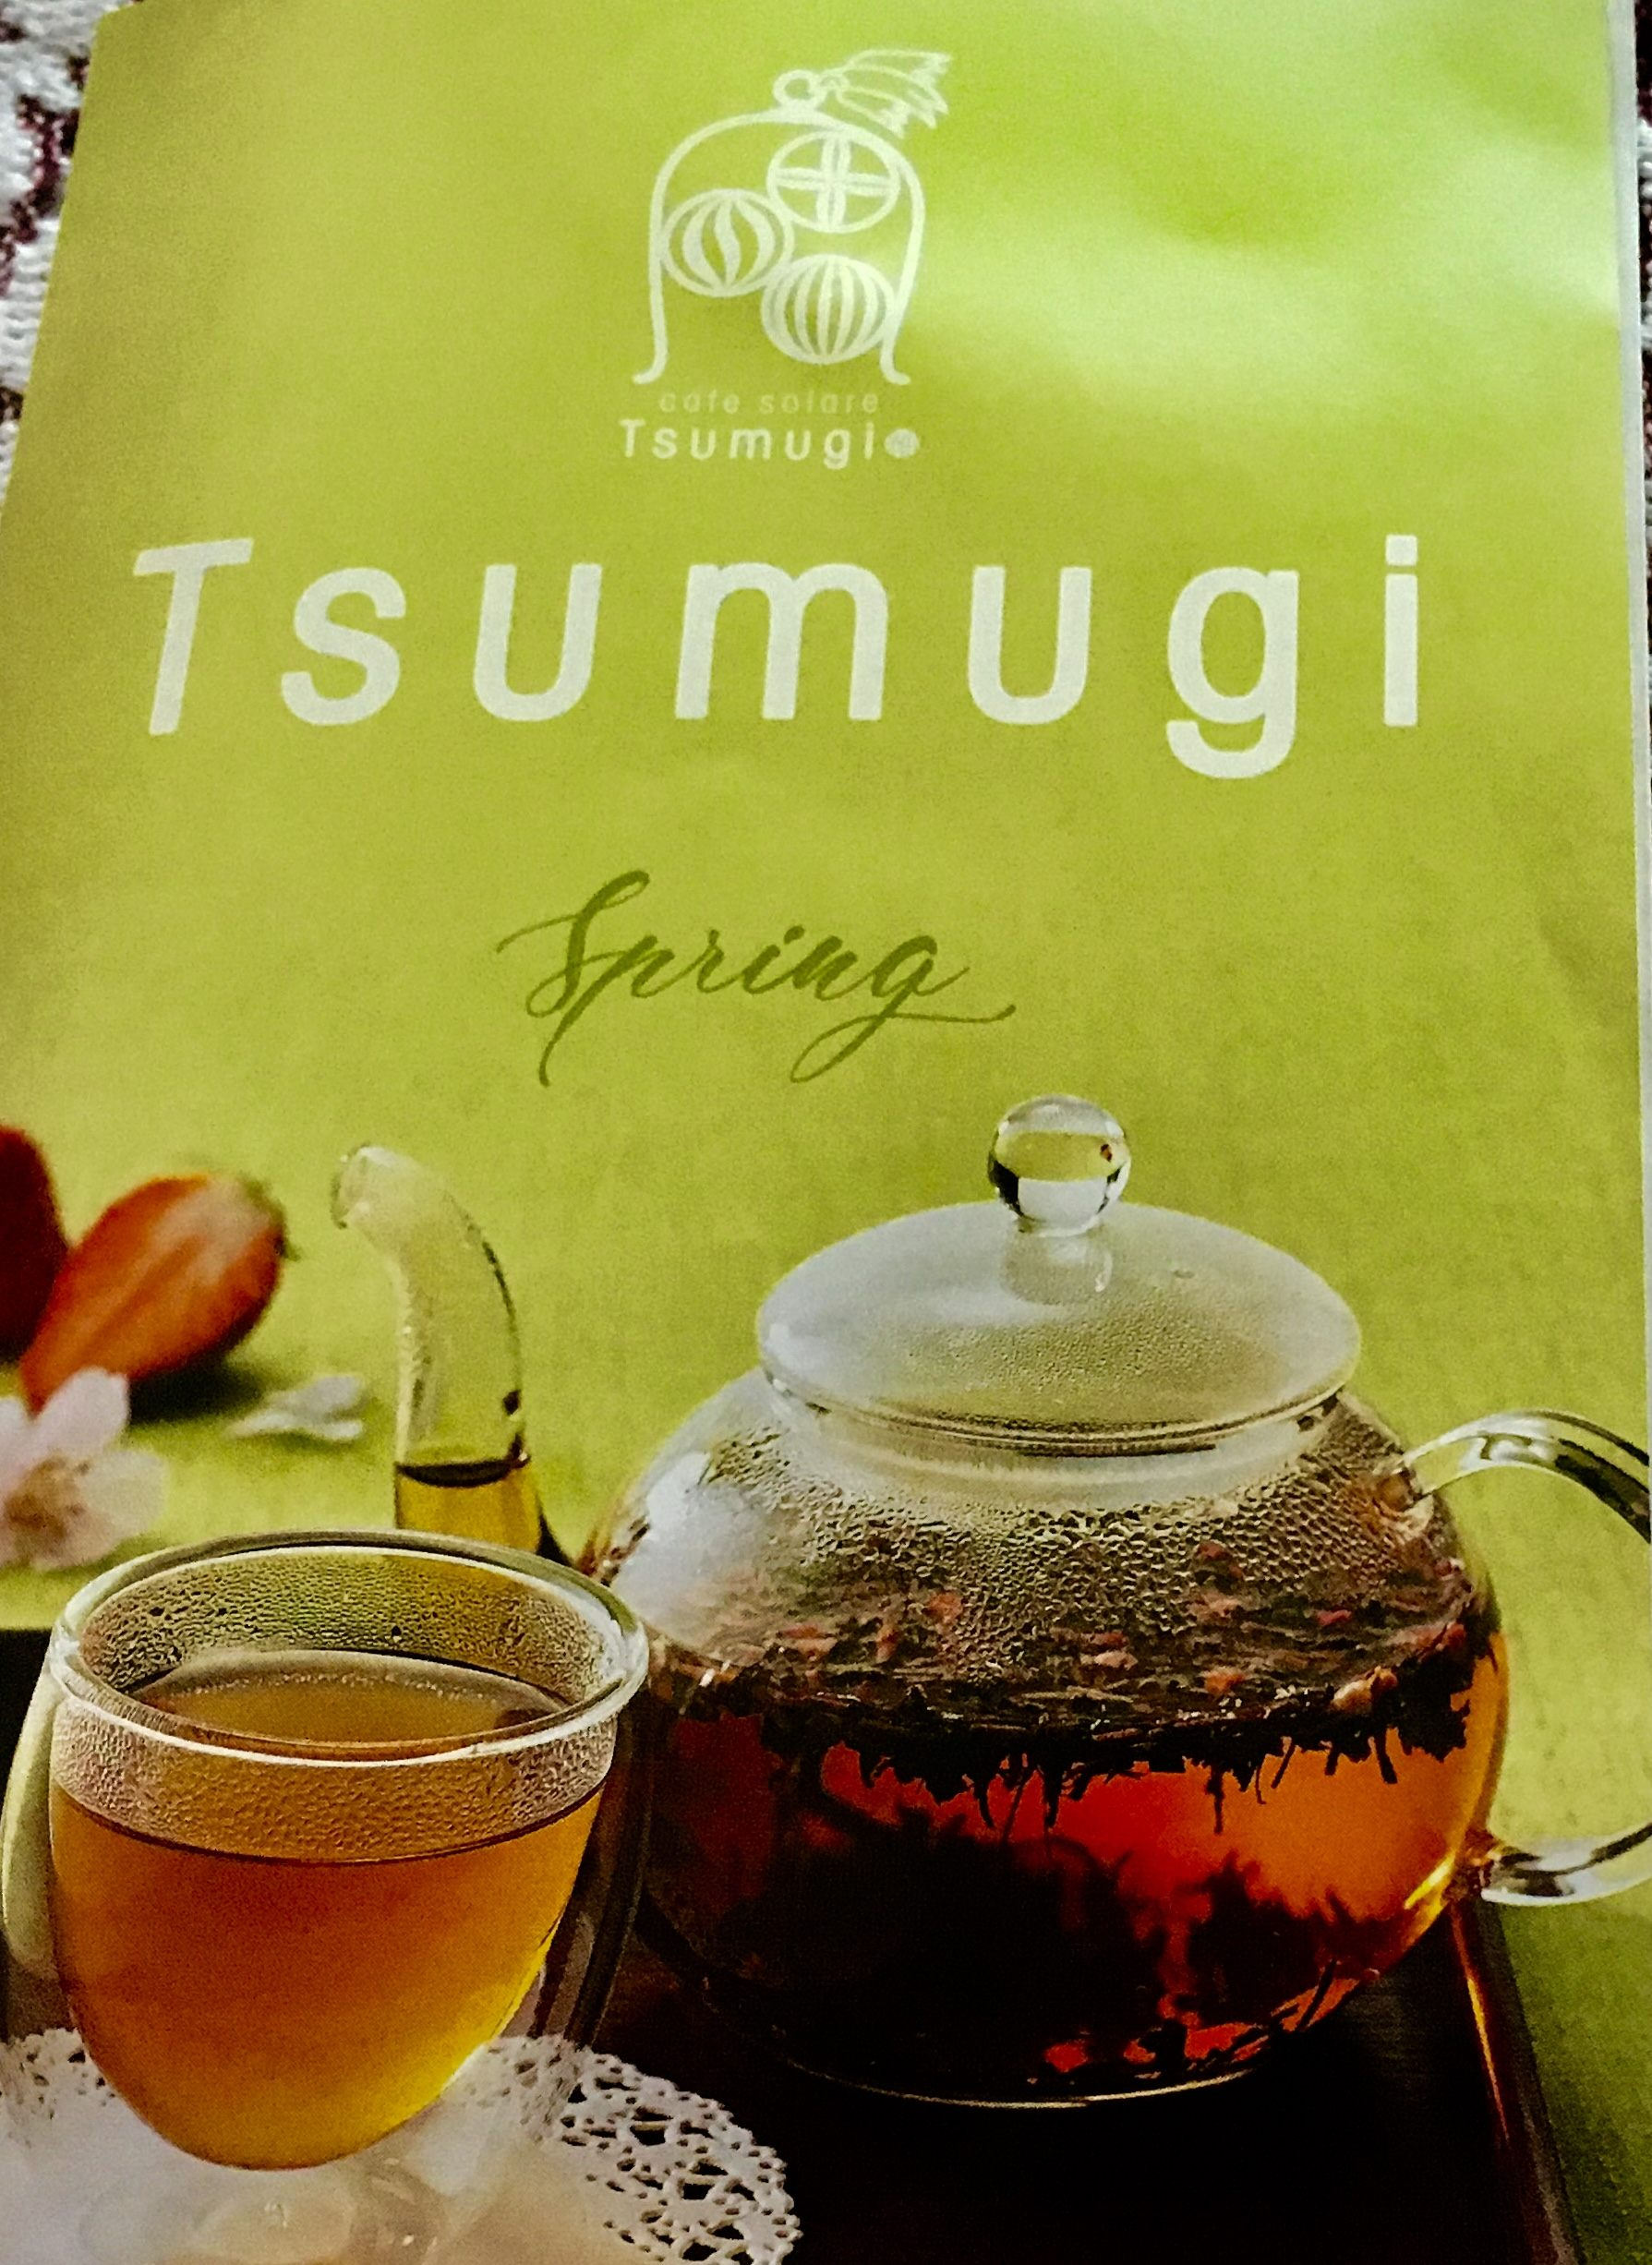 和式咖啡餐廳Tsumugi